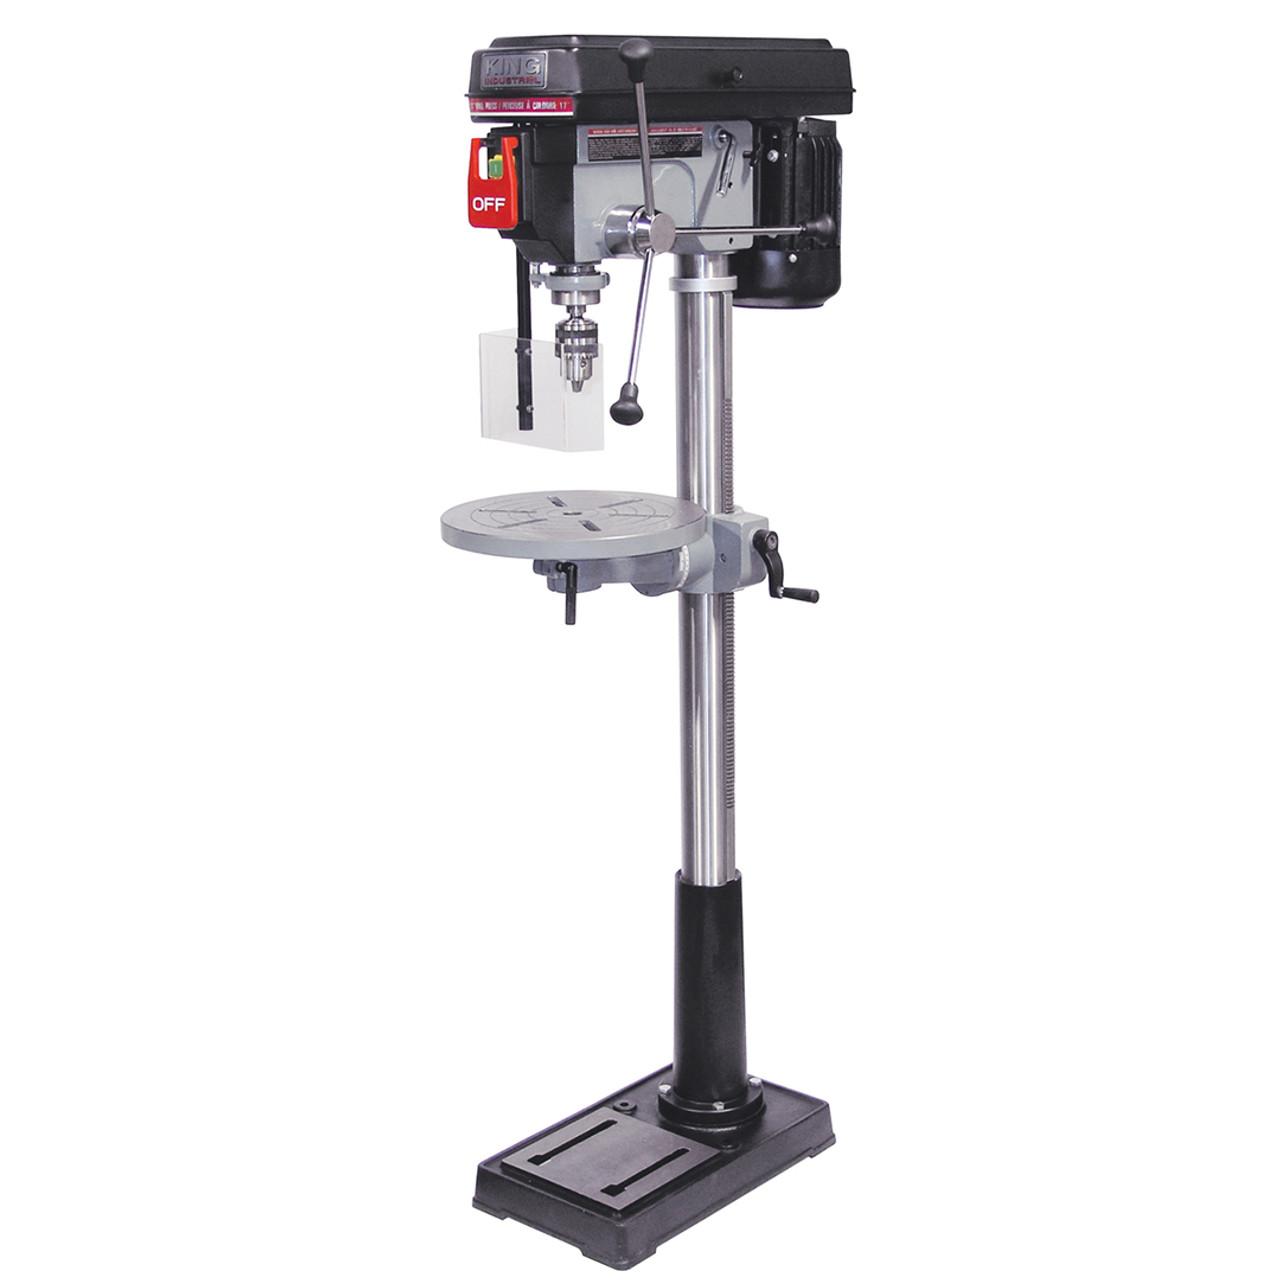 Drill Press Guard >> King Industrial Kc 118fc Ls 17 Drill Press With Safety Guard